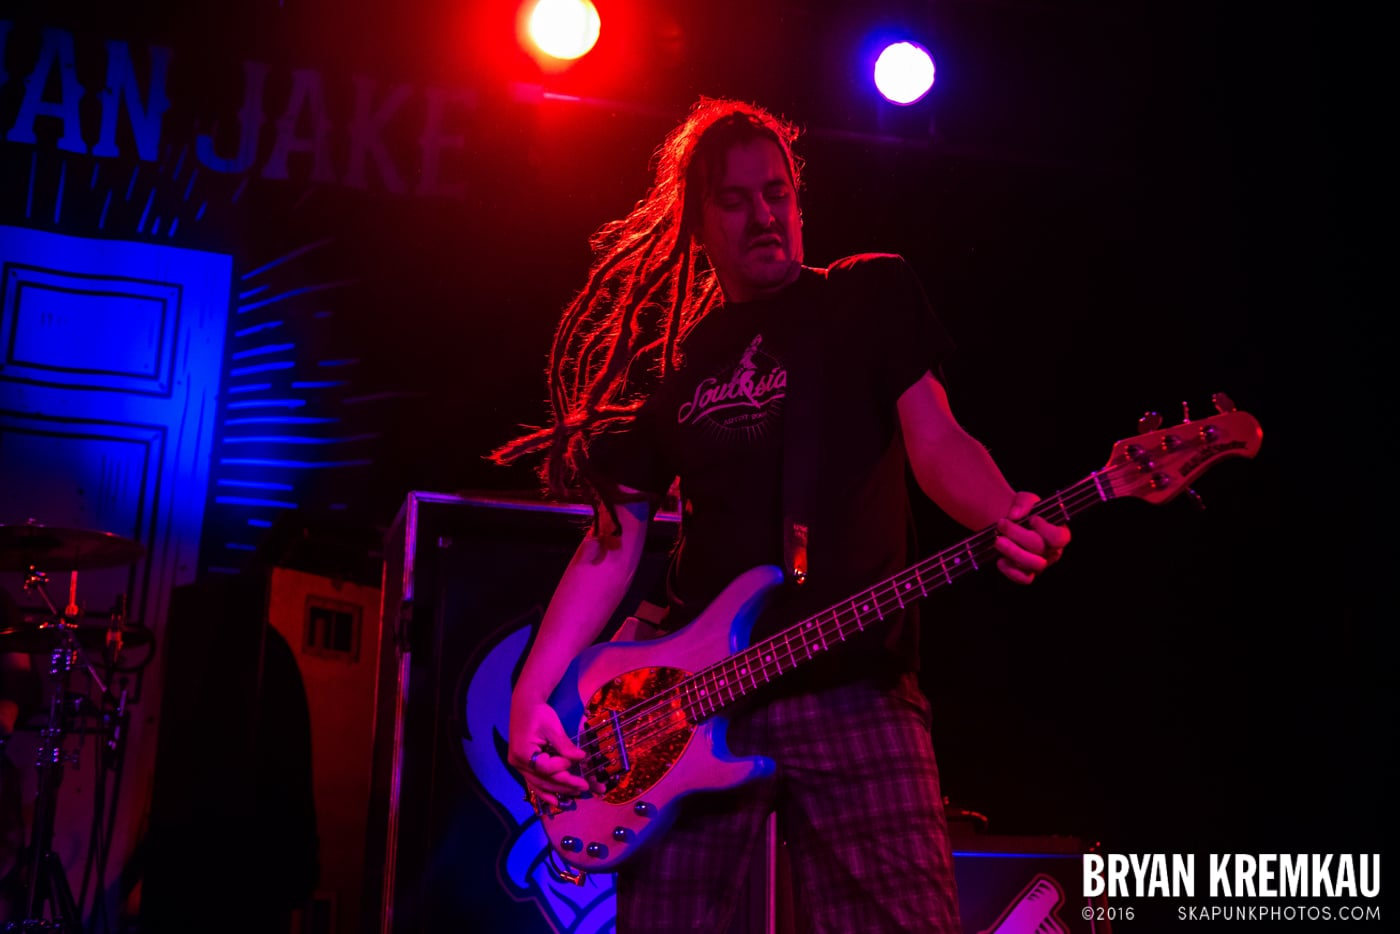 Less Than Jake @ Starland Ballroom, Sayreville, NJ - 11.9.13 (28)